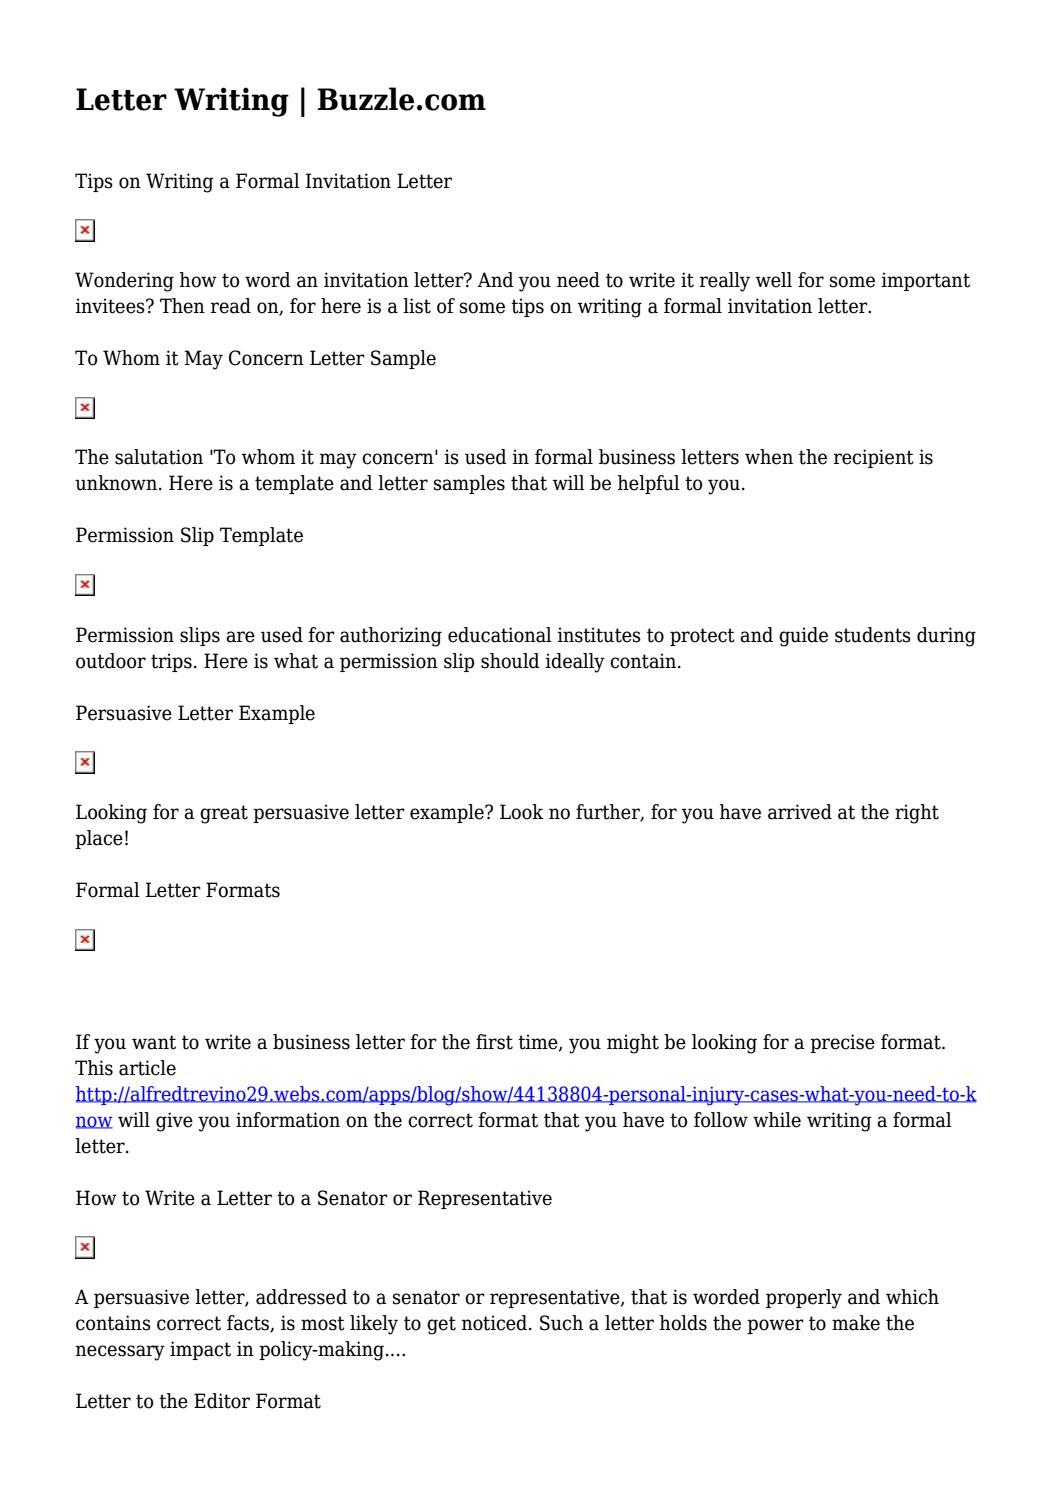 Letter Writing Buzzle Com By Gutierrezdnowsquzkx Issuu